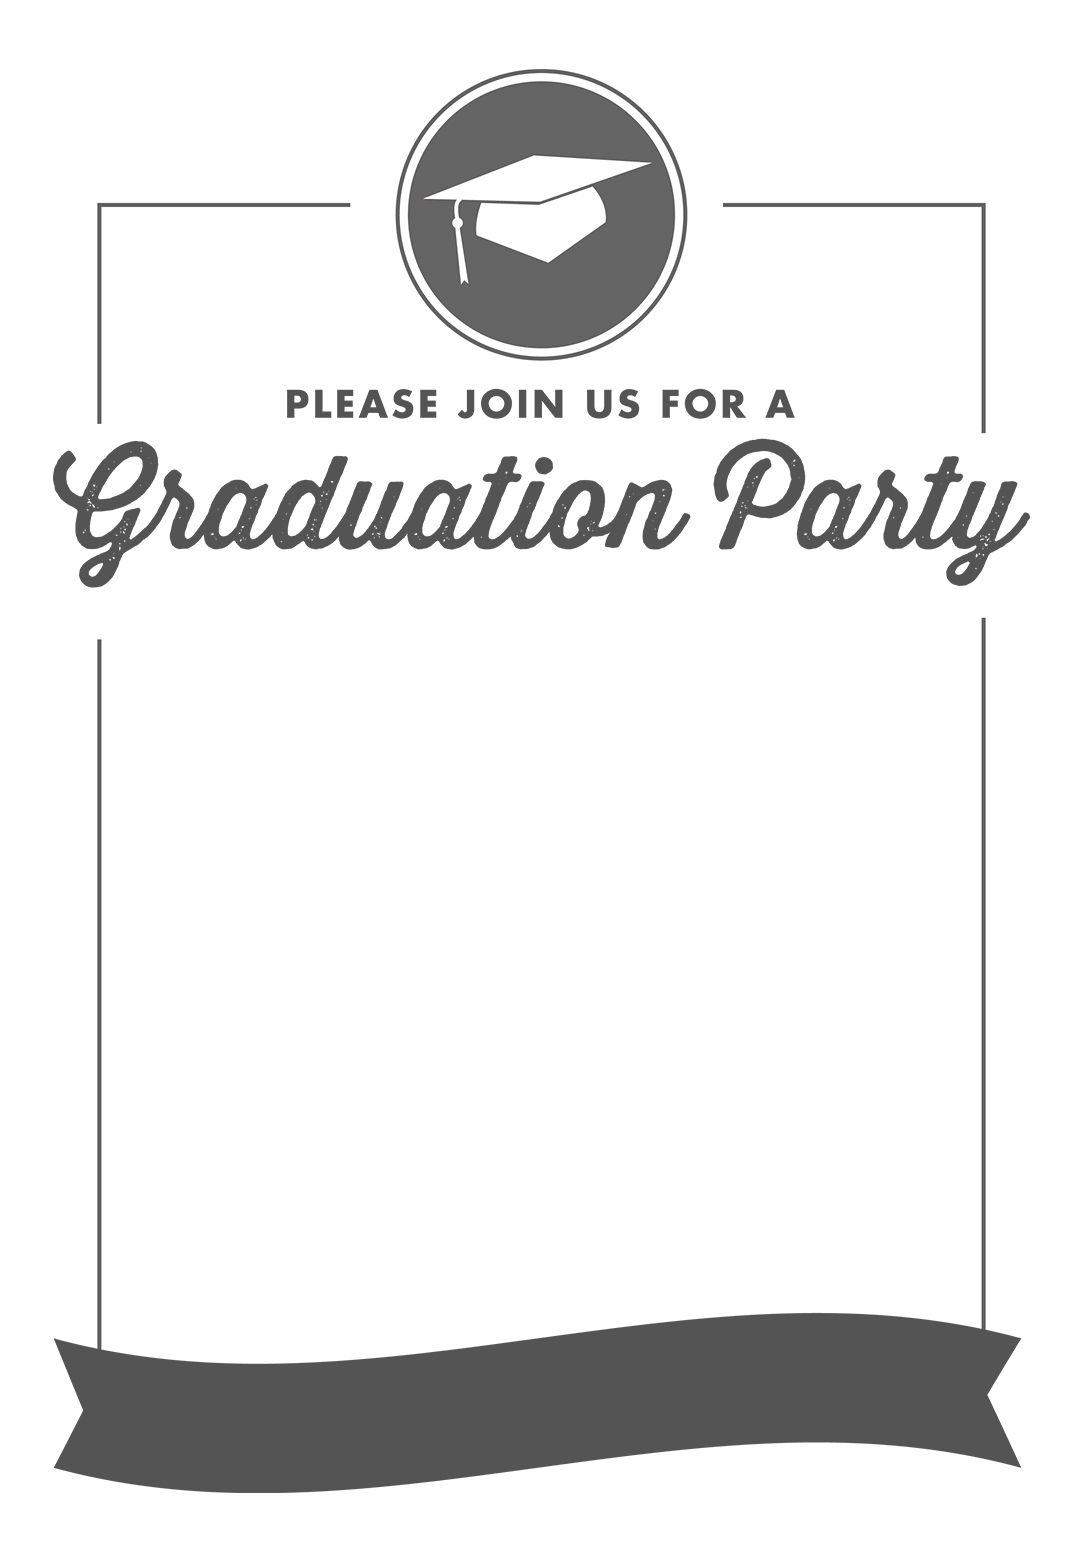 000 Sensational Graduation Party Invitation Template Example  Microsoft Word 4 Per PageFull